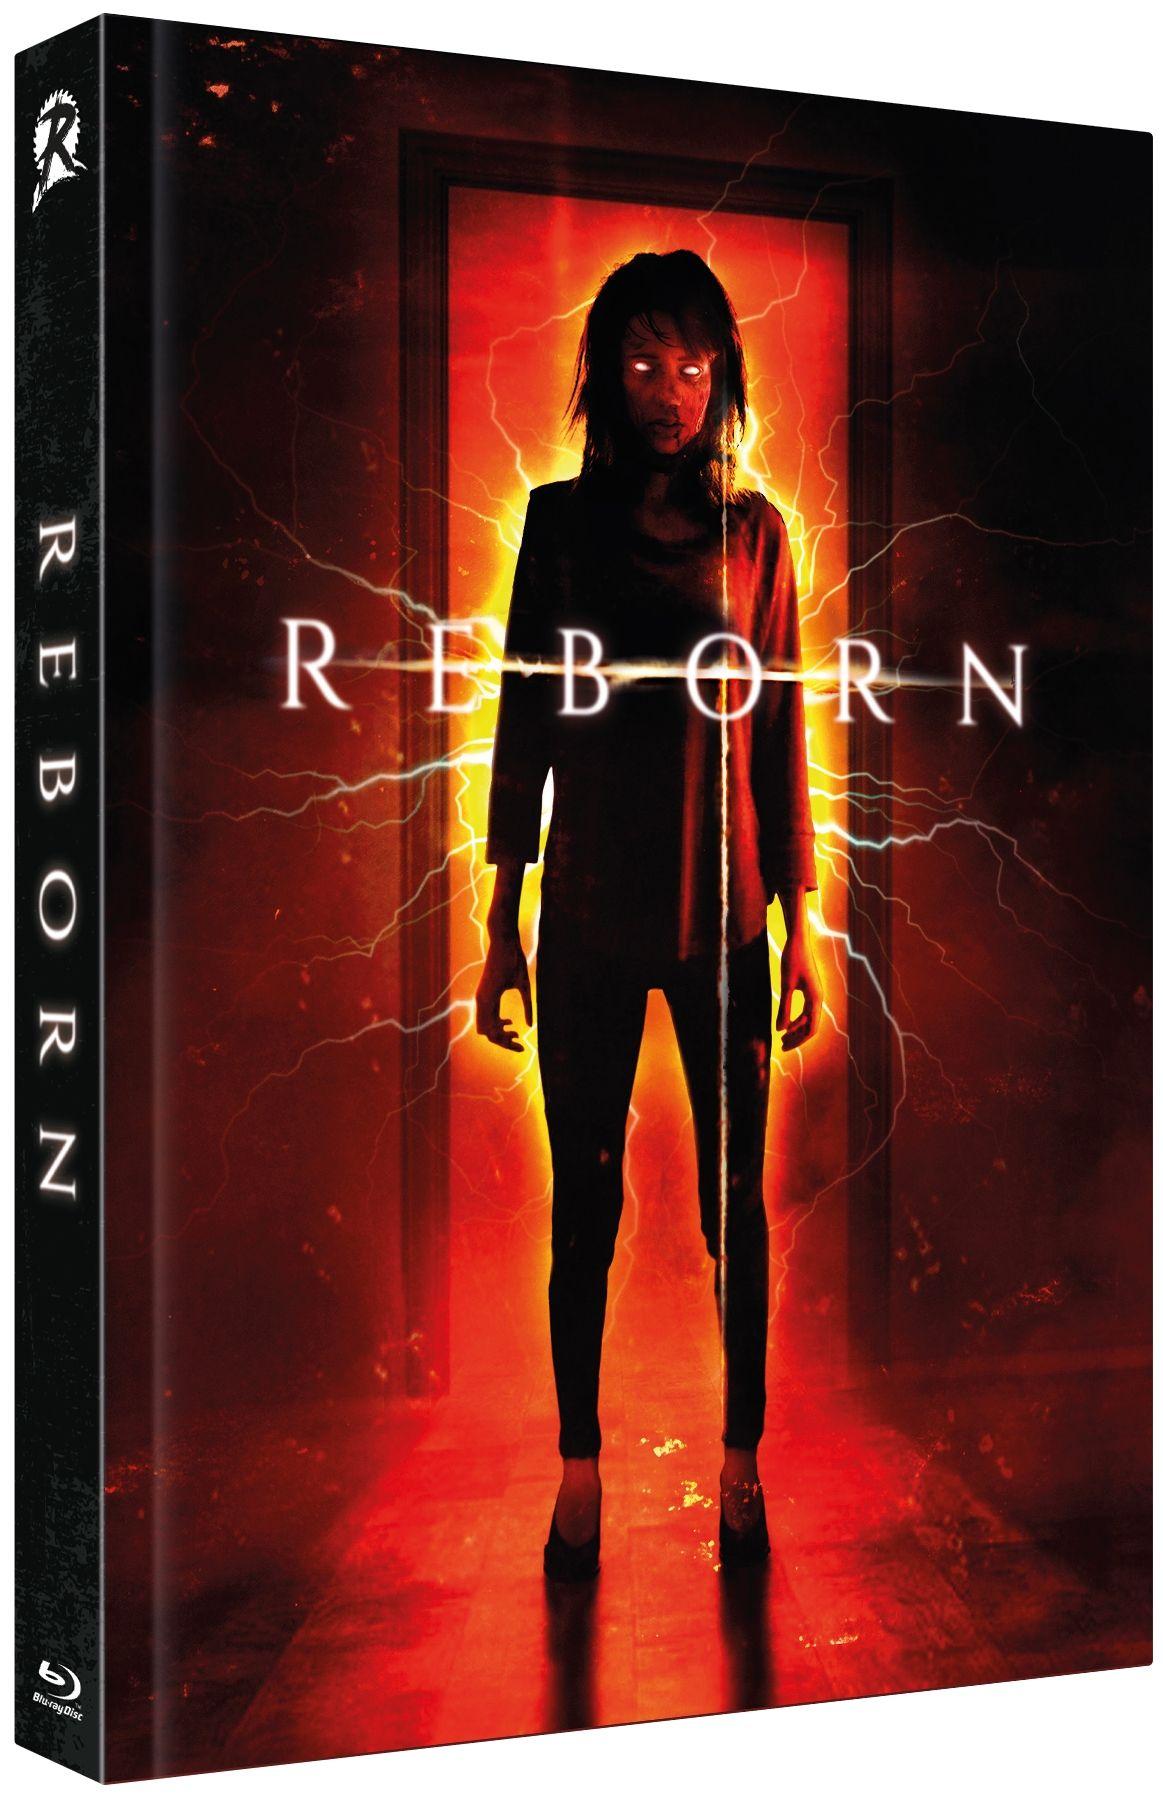 Reborn (Lim. Uncut Mediabook - Cover A) (DVD + BLURAY)